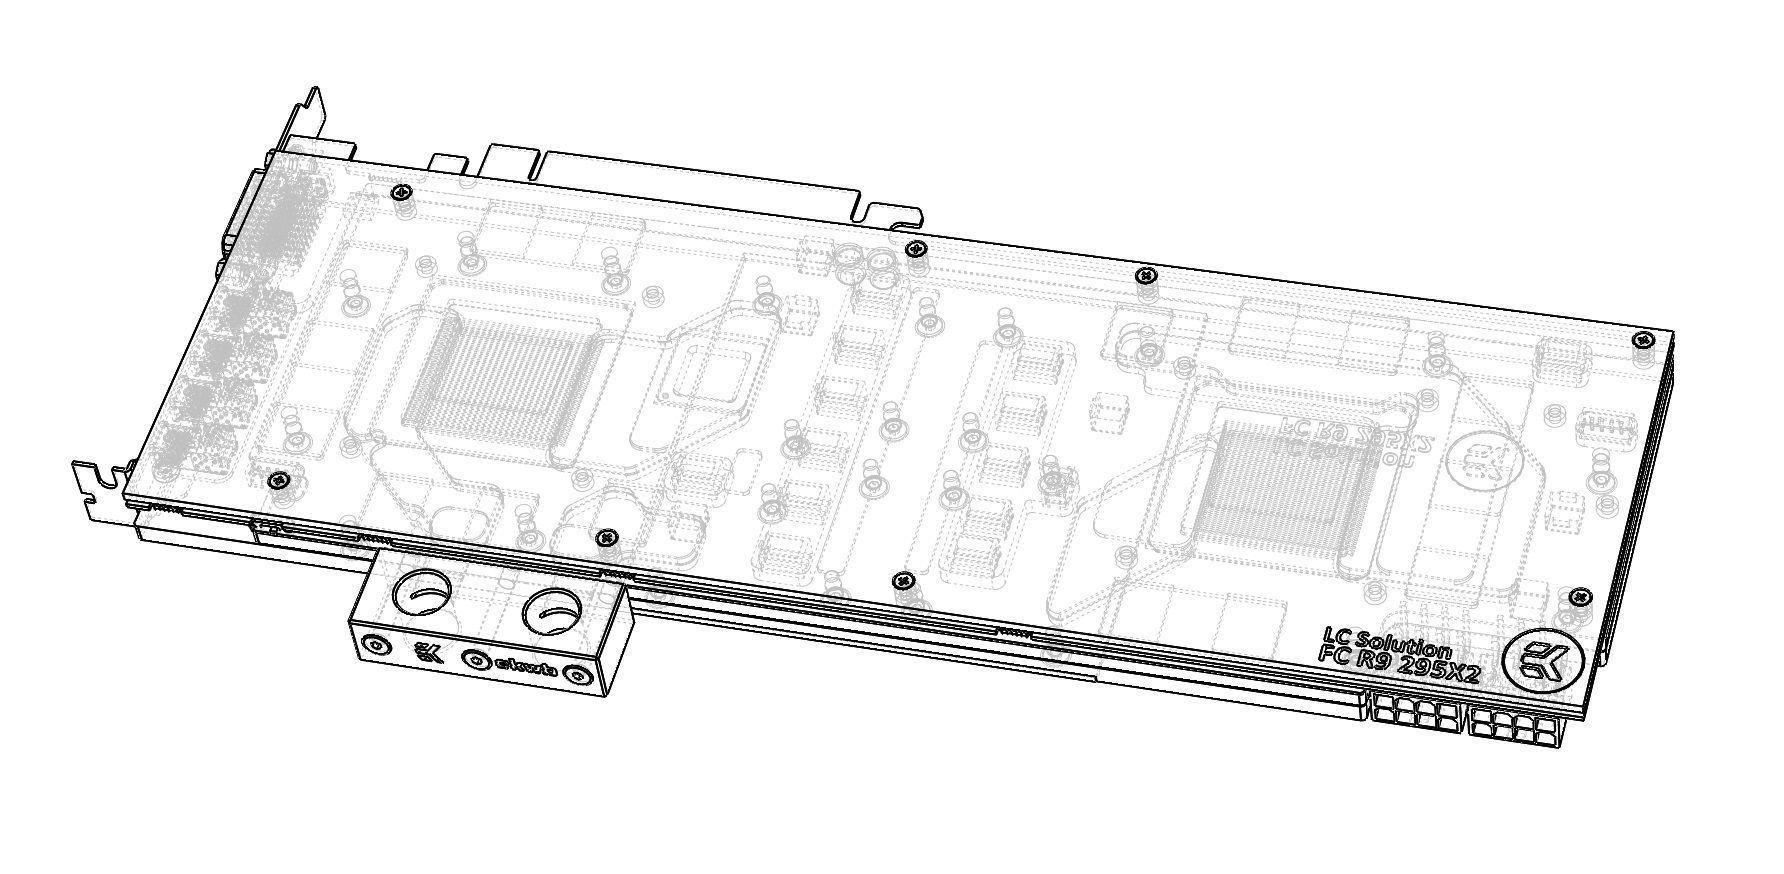 Schematic 3d Block Models Software Help Amd R9 295x2 And Ek Water Model Stl Sldprt Sldasm Slddrw